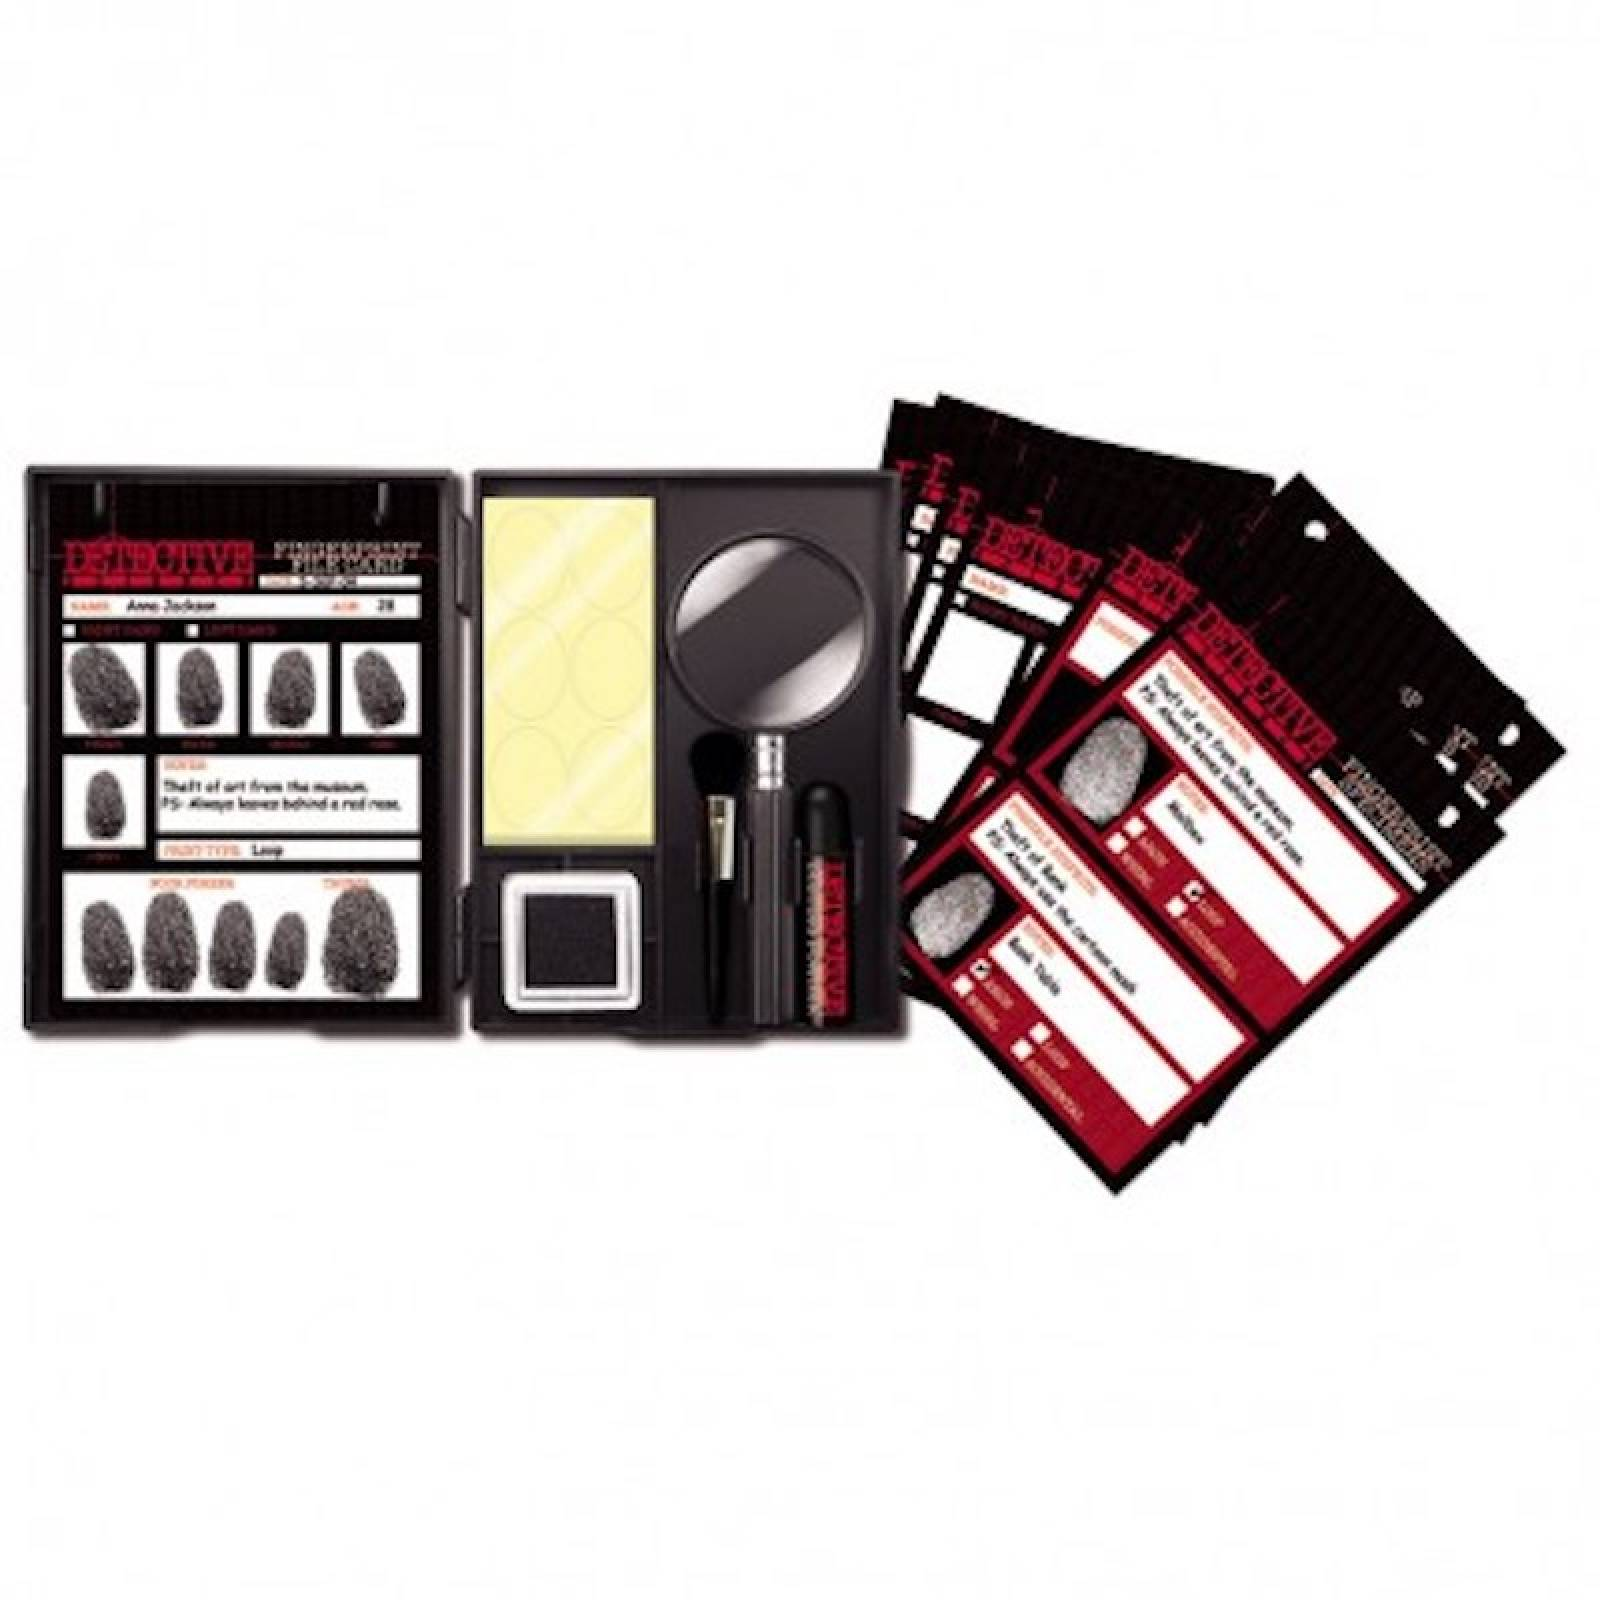 Detective Finger Print Kit for Spys - Kidz Labs thumbnails